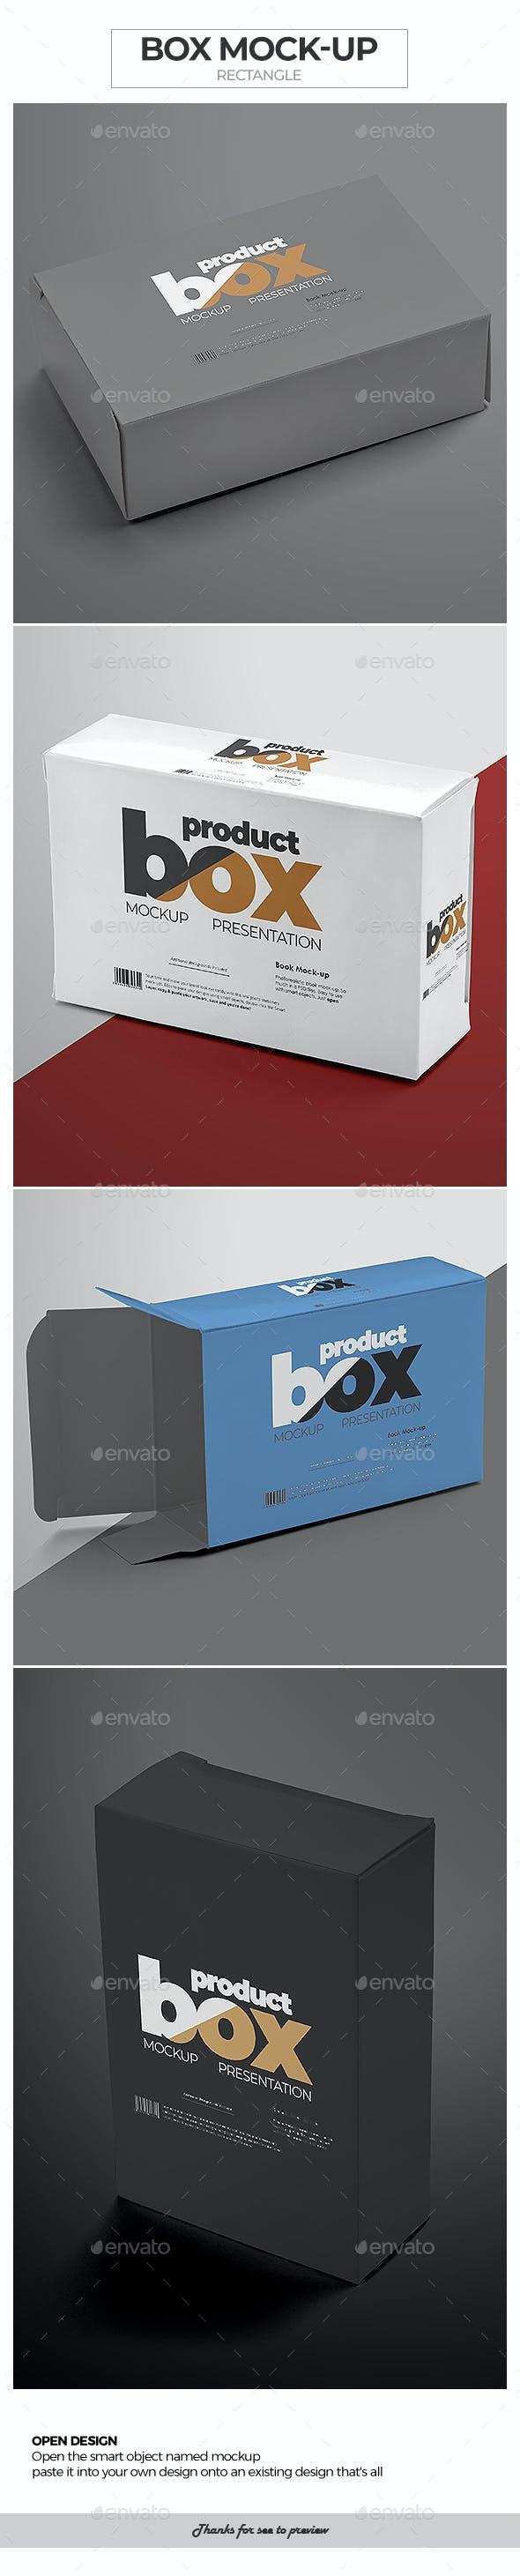 Box Mock-Up / Rectangle